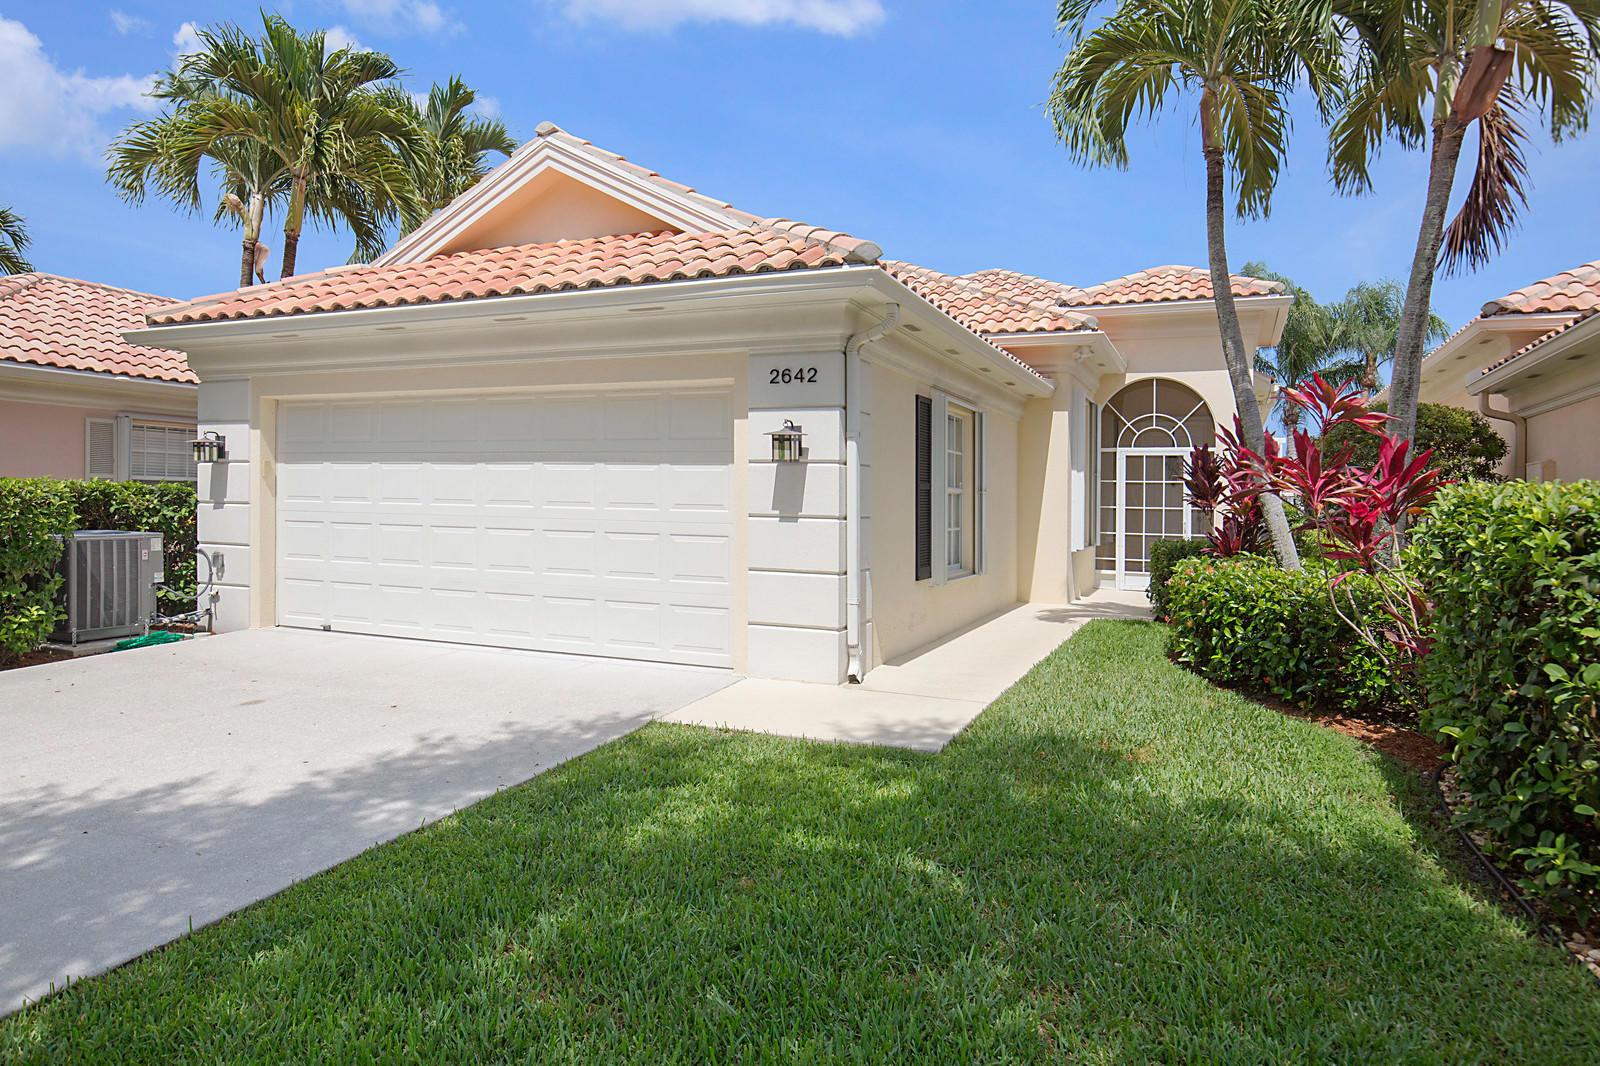 2642 James River Road West Palm Beach, FL 33411